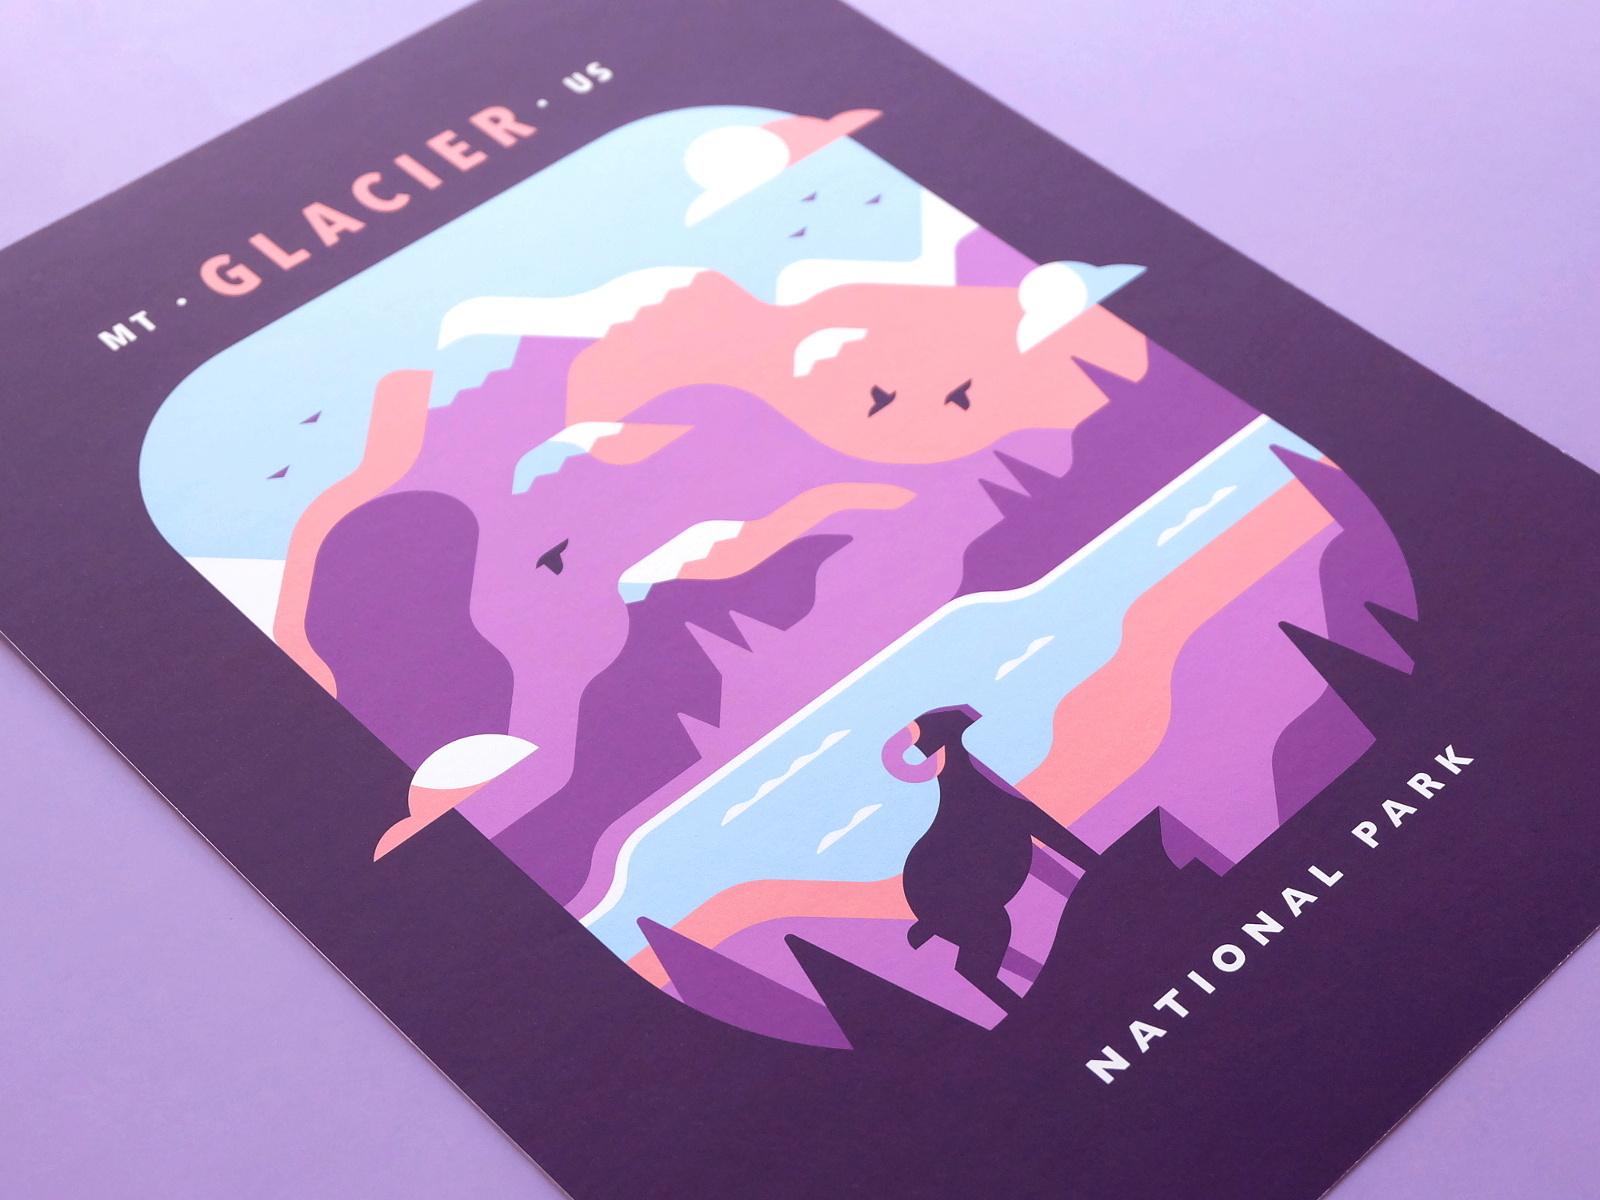 matt-anderson-canopy-glacier-park-product-photo.jpg